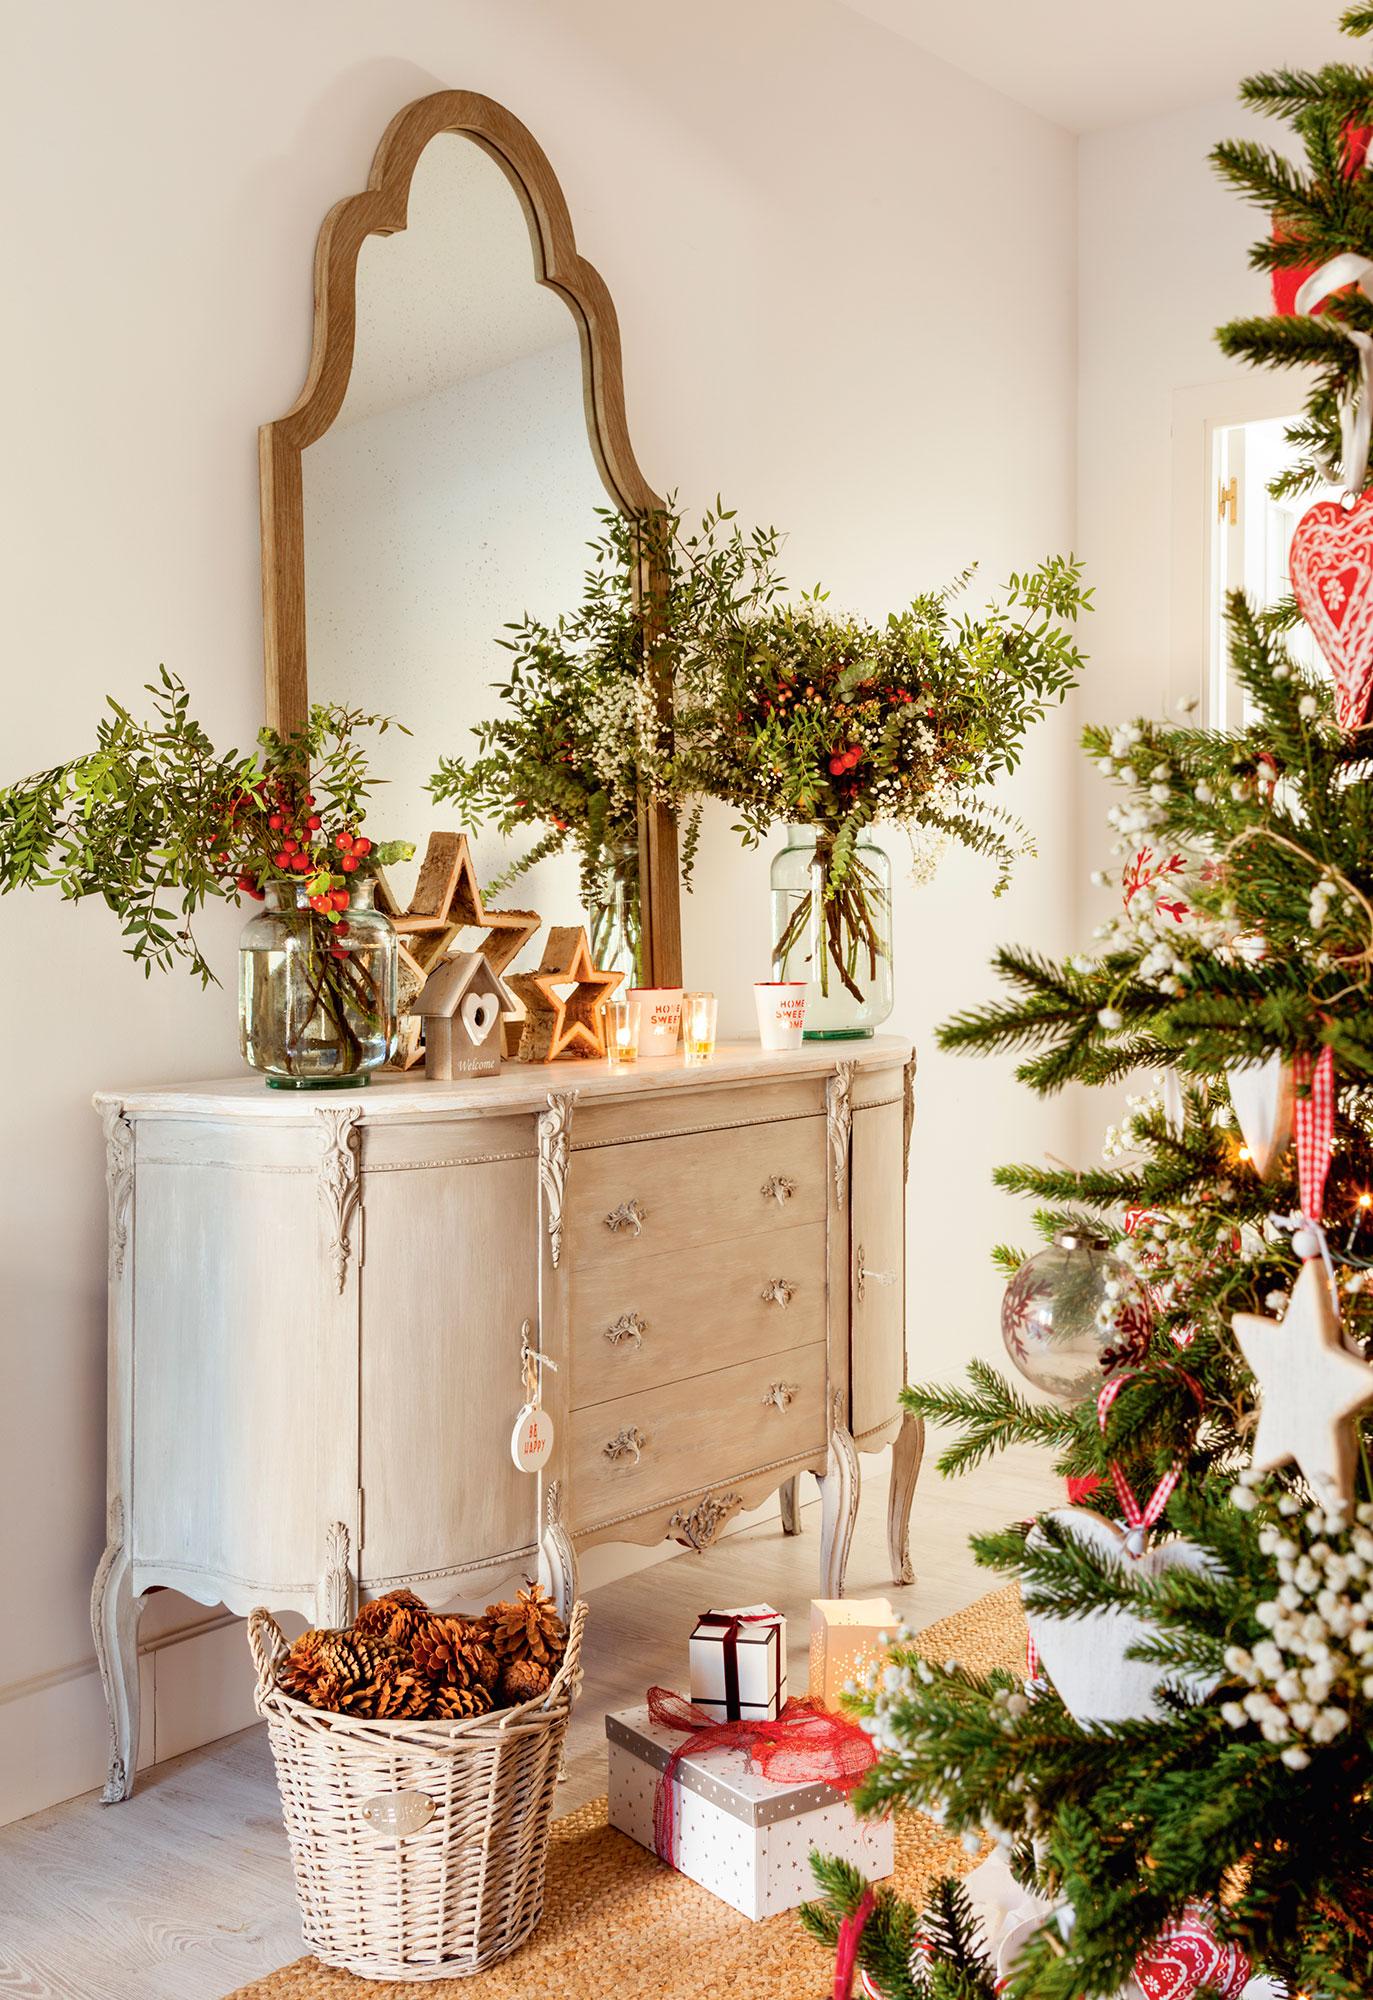 Navidad ideas para decorar de verde natural tu recibidor - Comoda recibidor ...